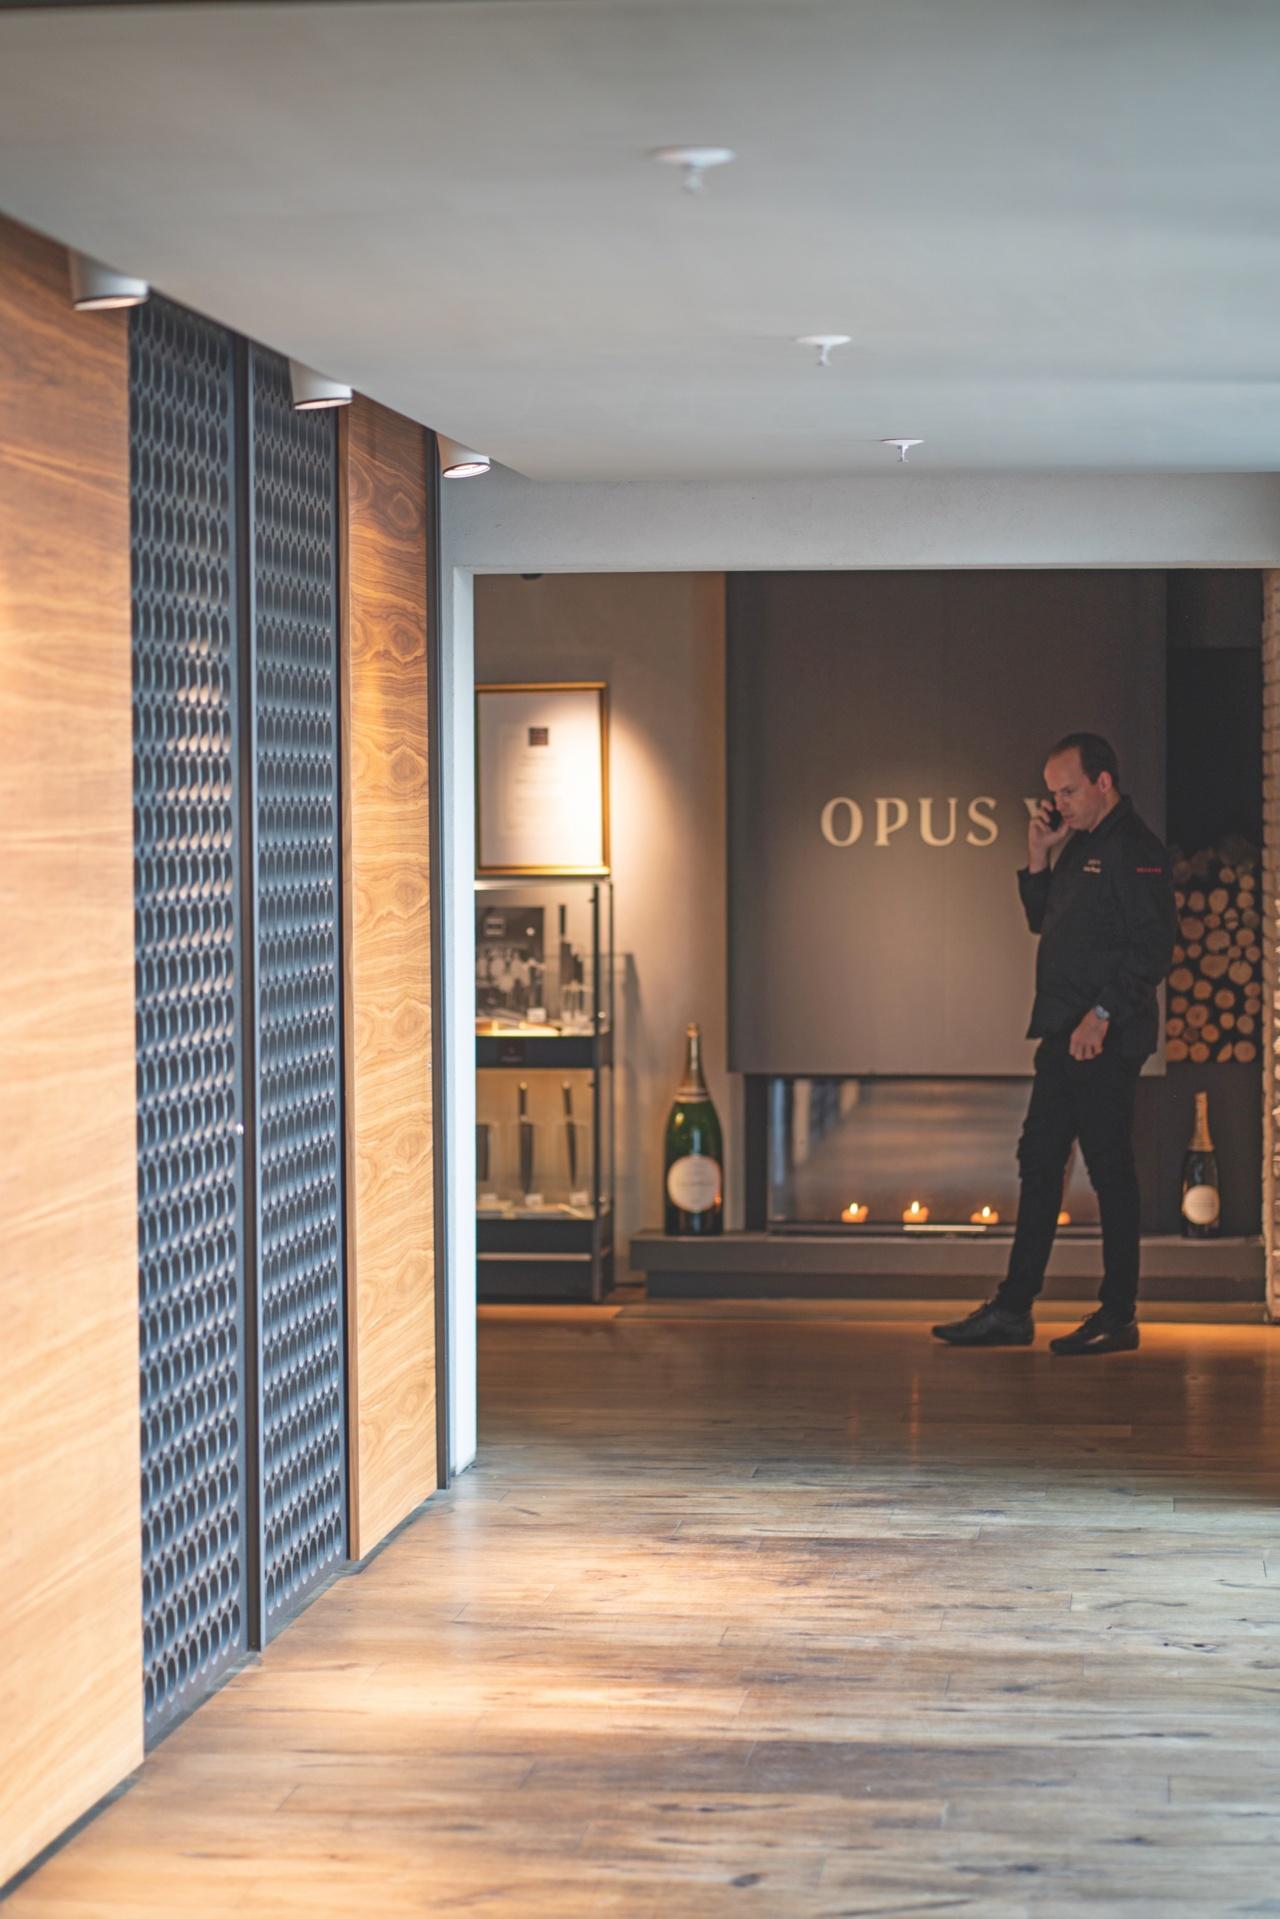 Restaurant Opus V in Mannheim